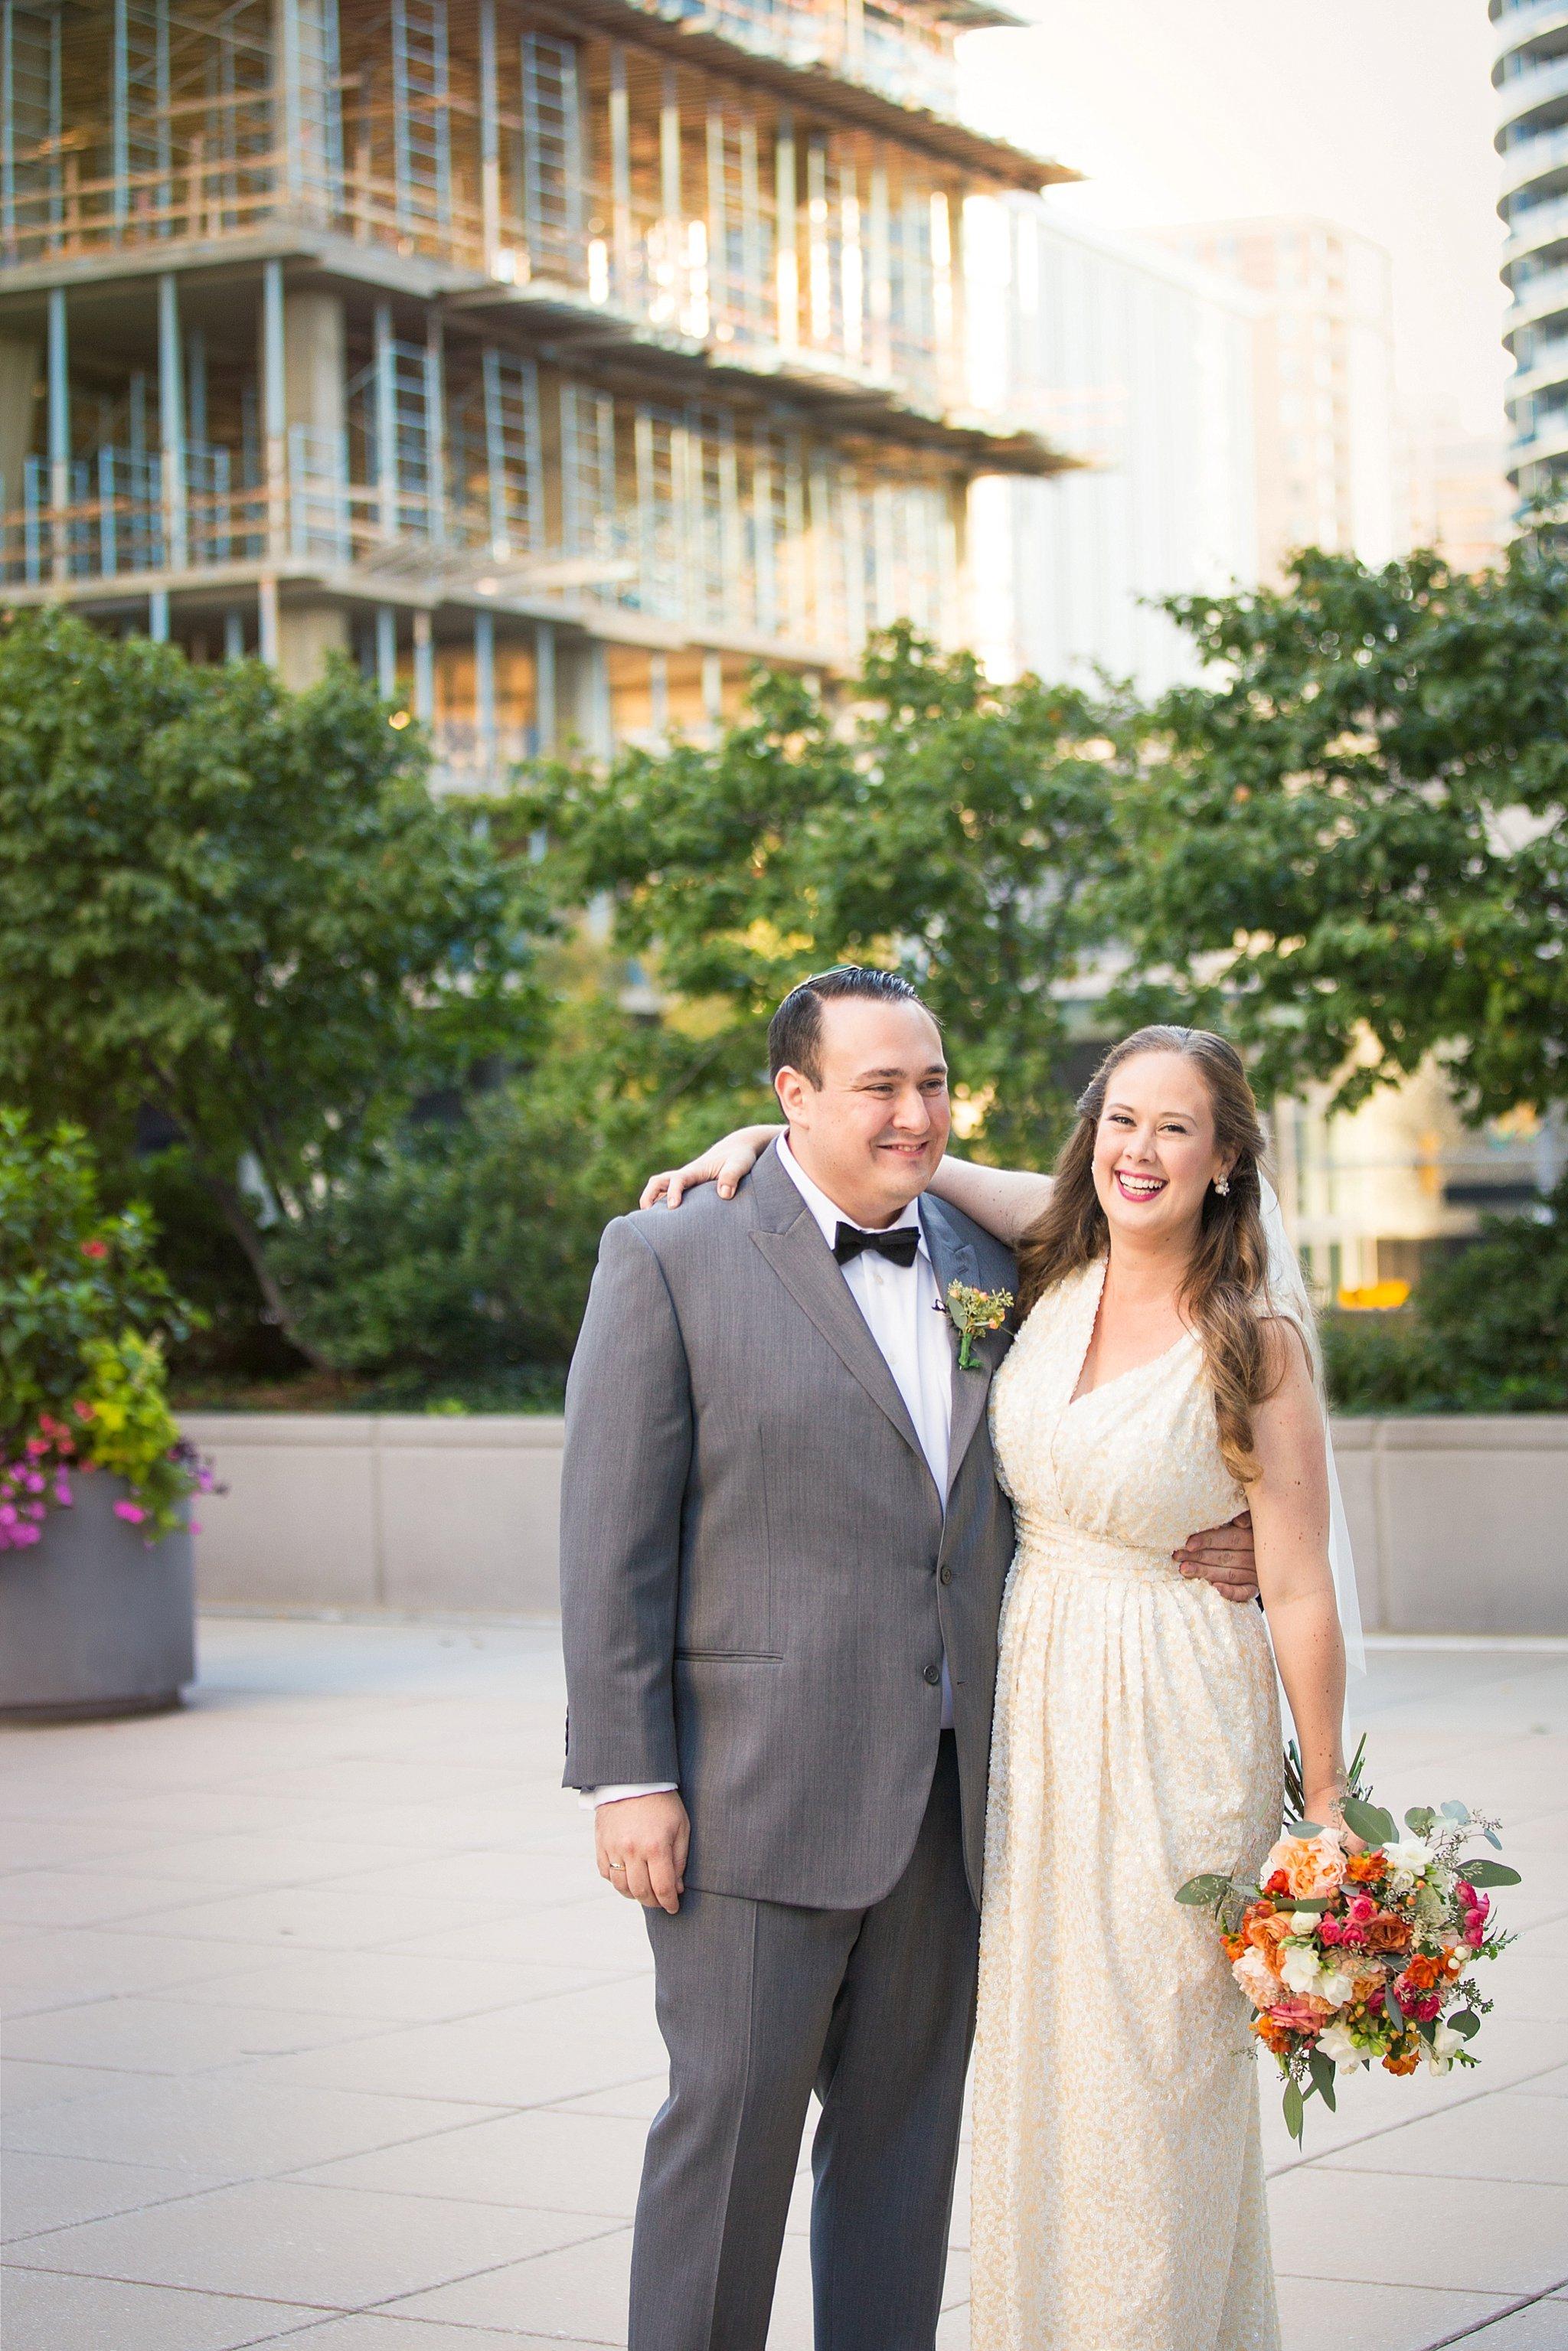 wedding photographers with best reviews Arlington Virginia